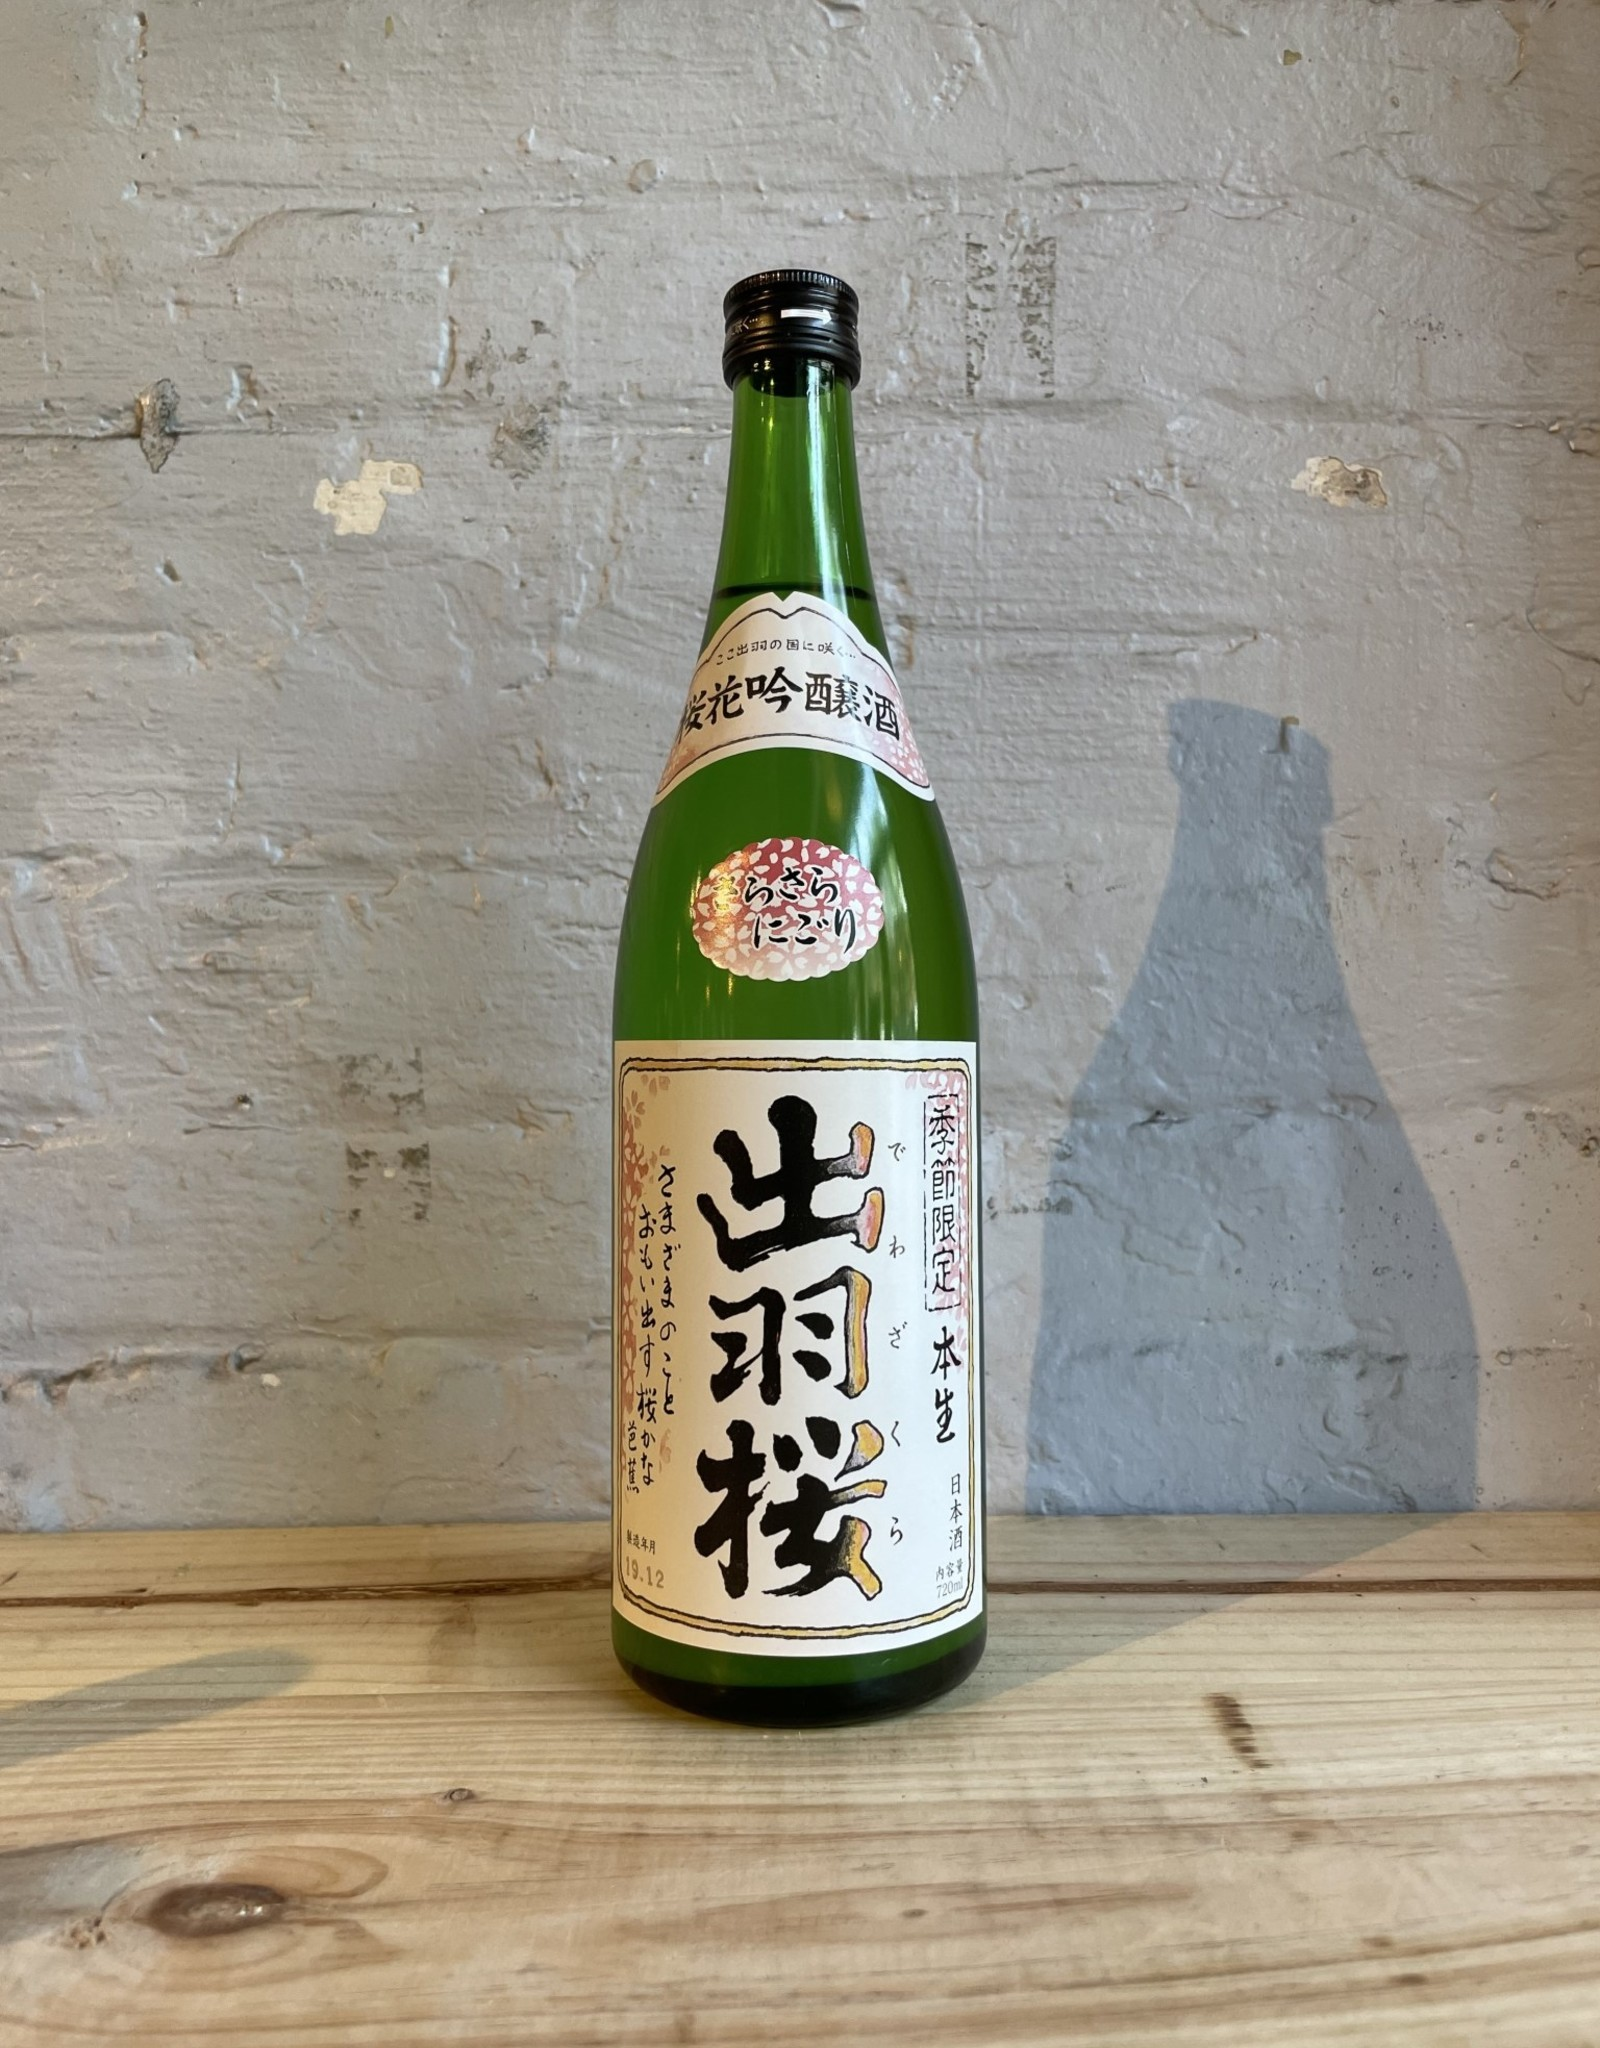 Sake & Shochu Dewazakura Sarasara Nigori Ginjo Sake - Yamagata, Japan (720ml)